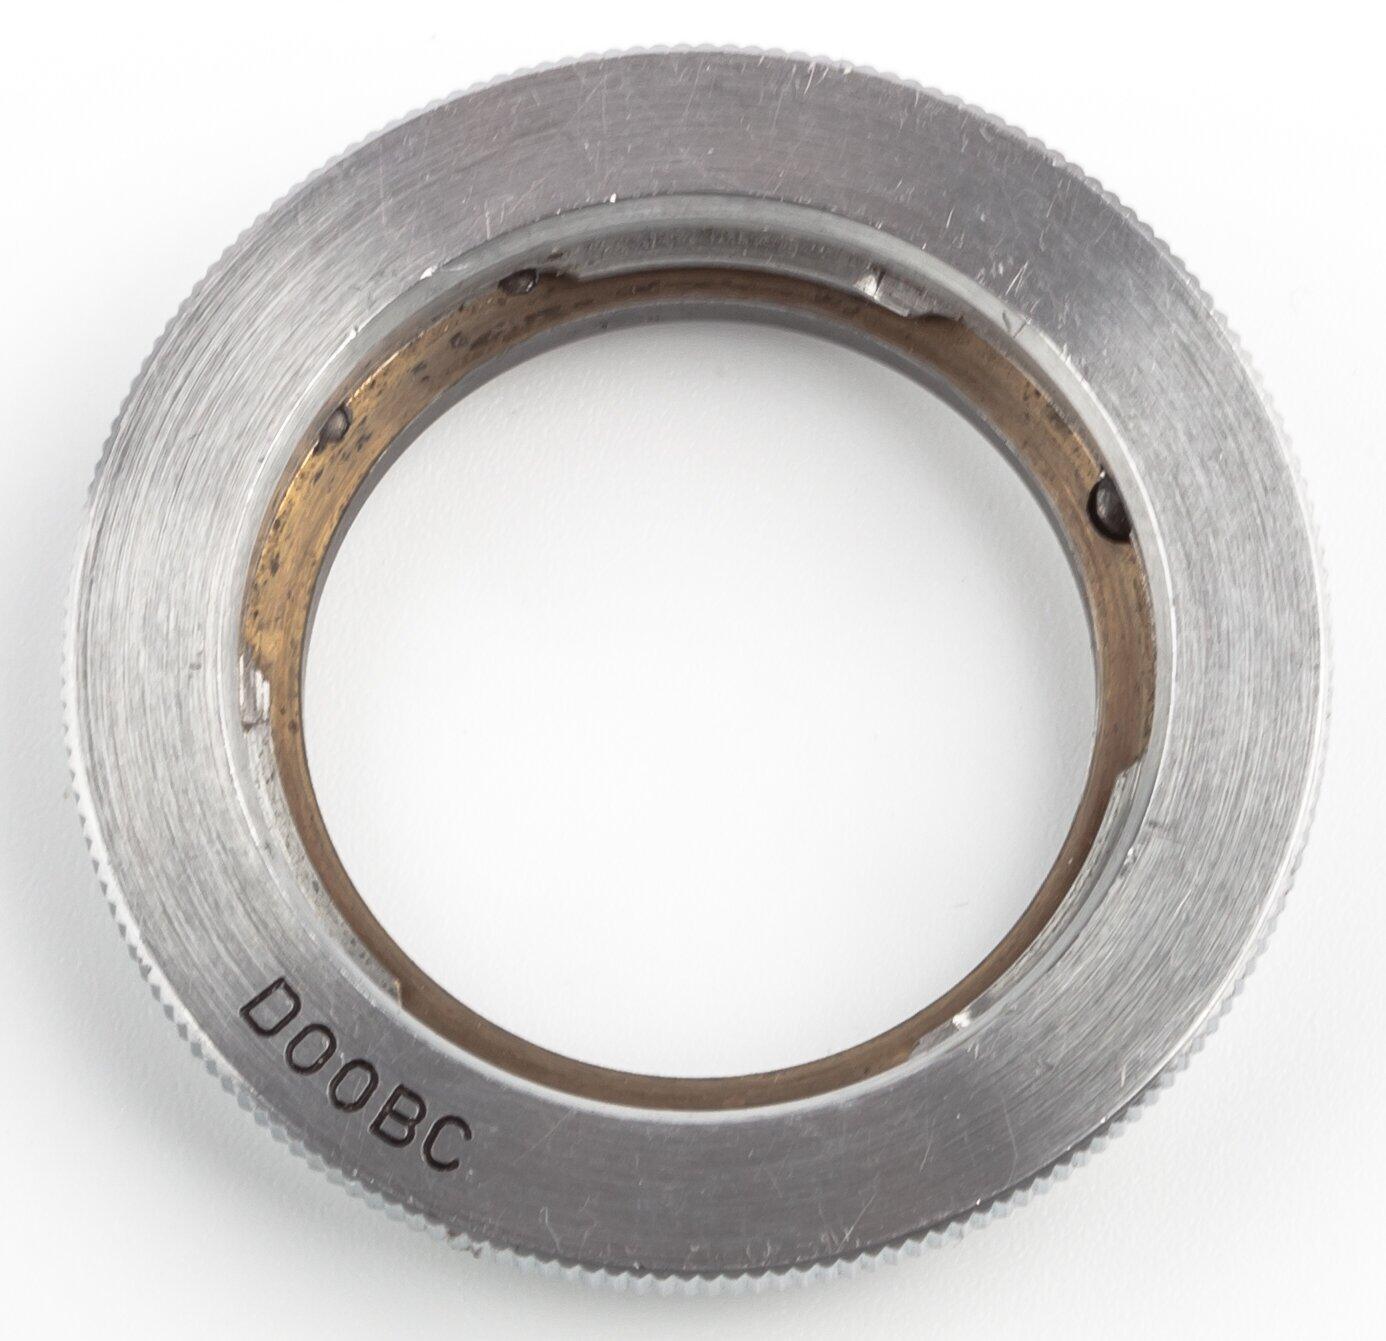 Leica Adapter DOOBC 17671